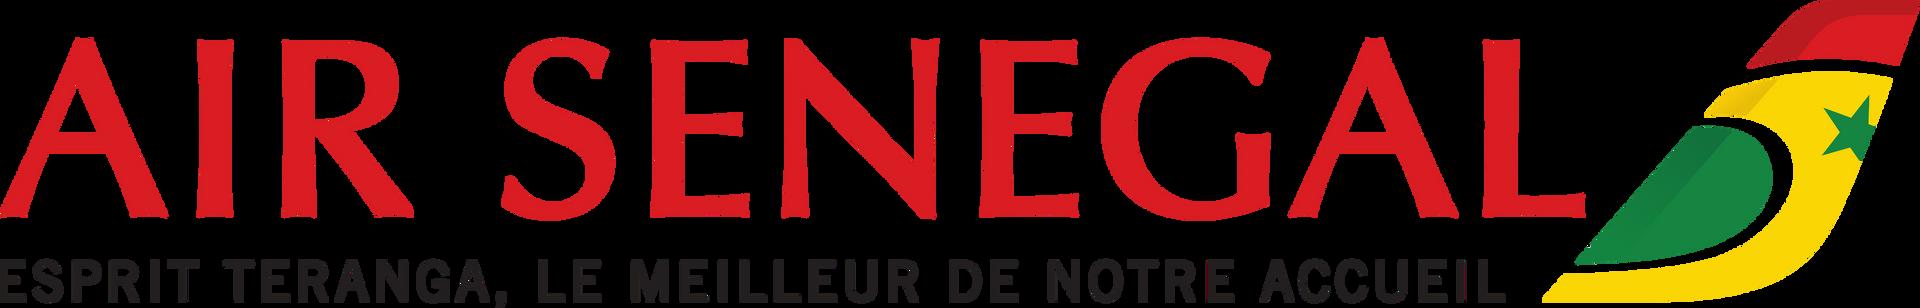 air-senegal-logo-horizontal-signature-_1